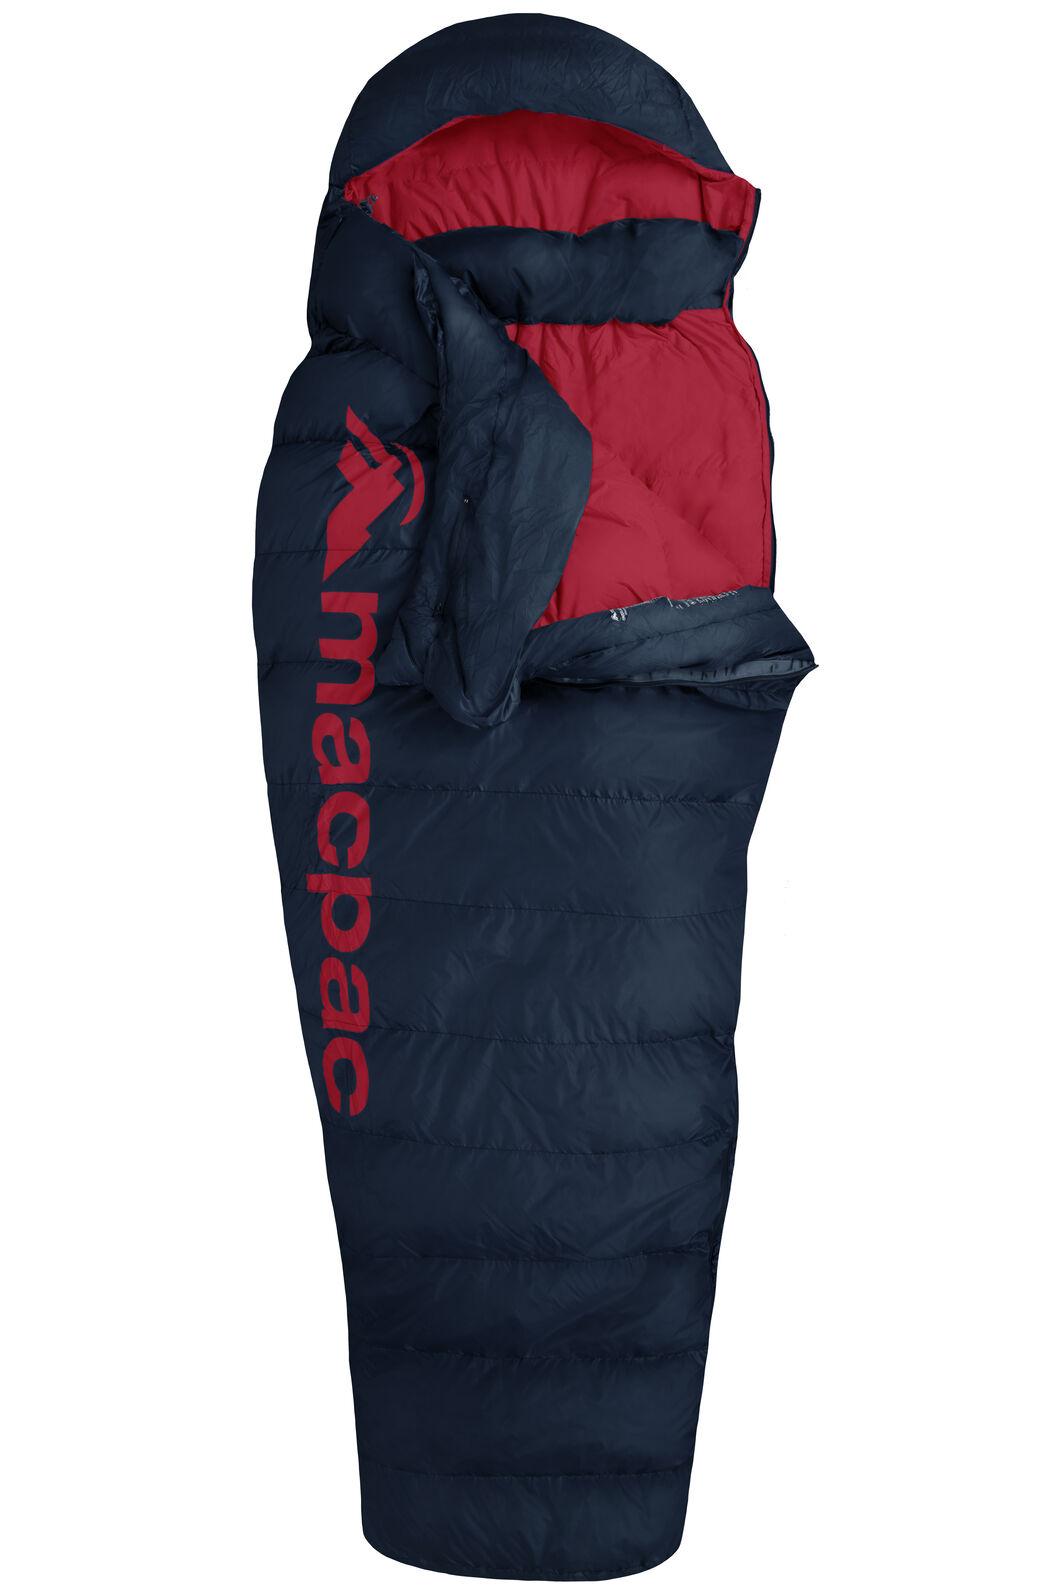 Macpac Overland 400 Women's Down Sleeping Bag, Black Iris/Flame Scarlet, hi-res